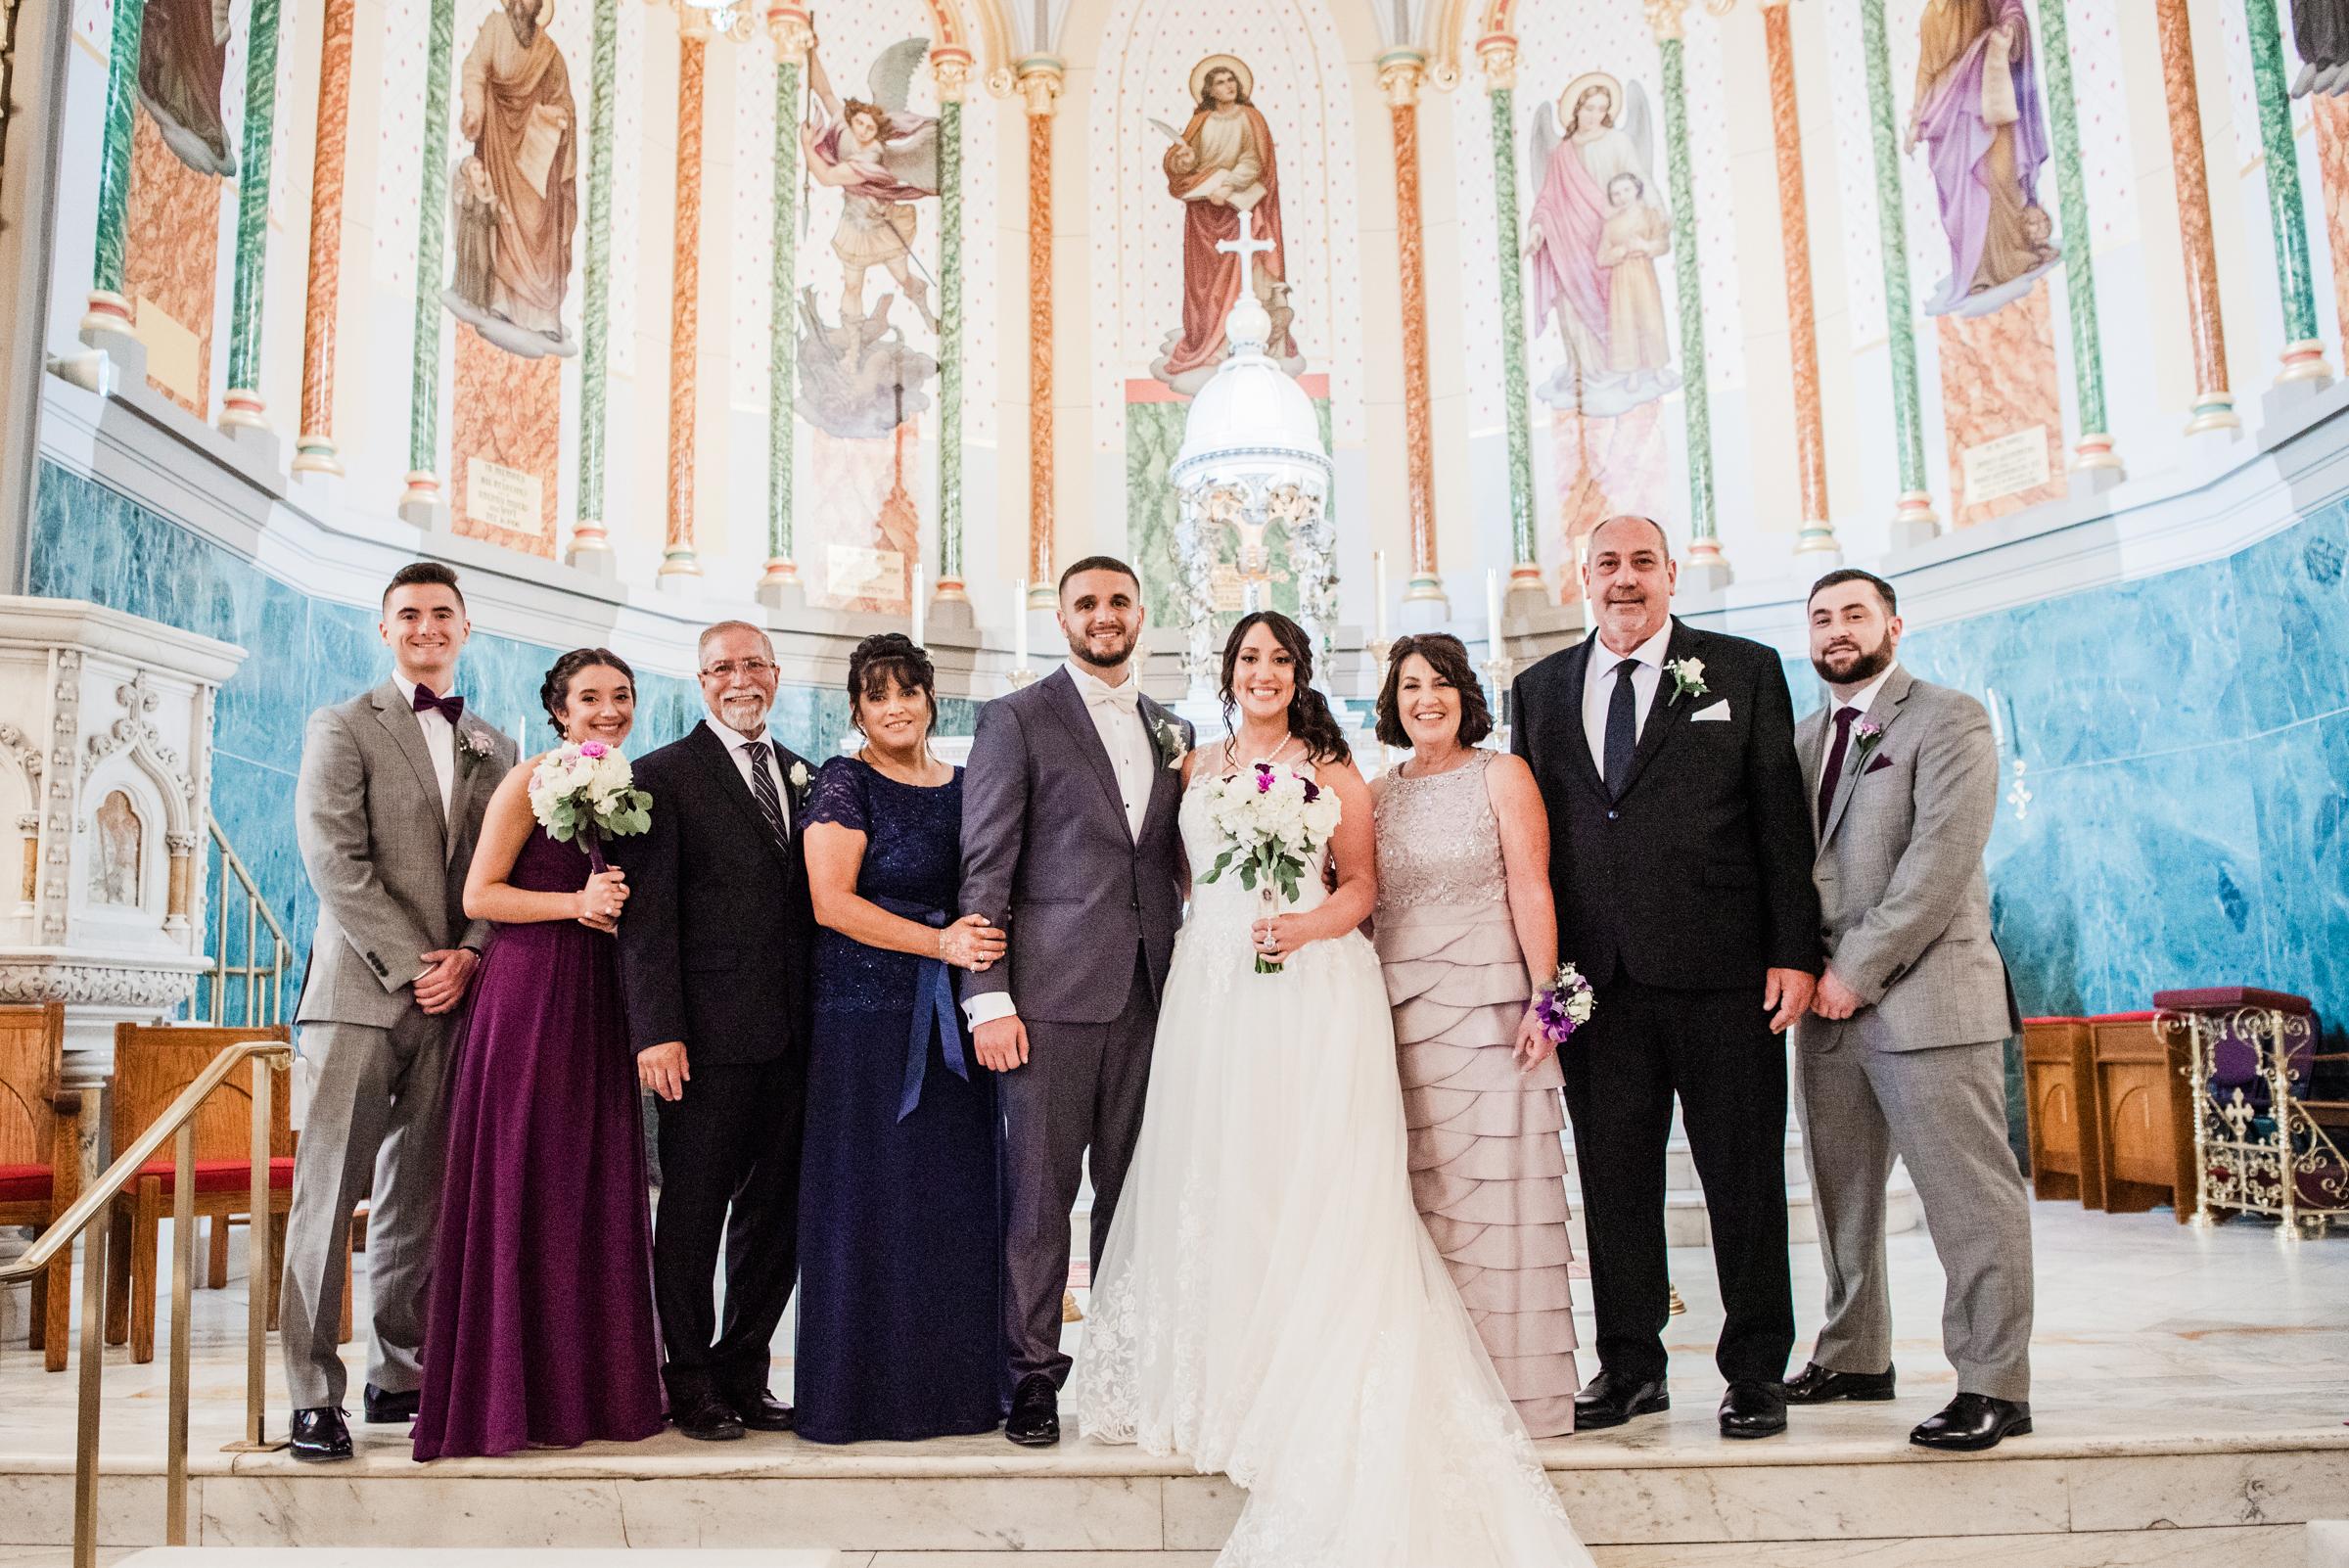 Historic_Old_St_Johns_Church_Valentinos_Banquet_Hall_Central_NY_Wedding_JILL_STUDIO_Rochester_NY_Photographer_DSC_5958.jpg